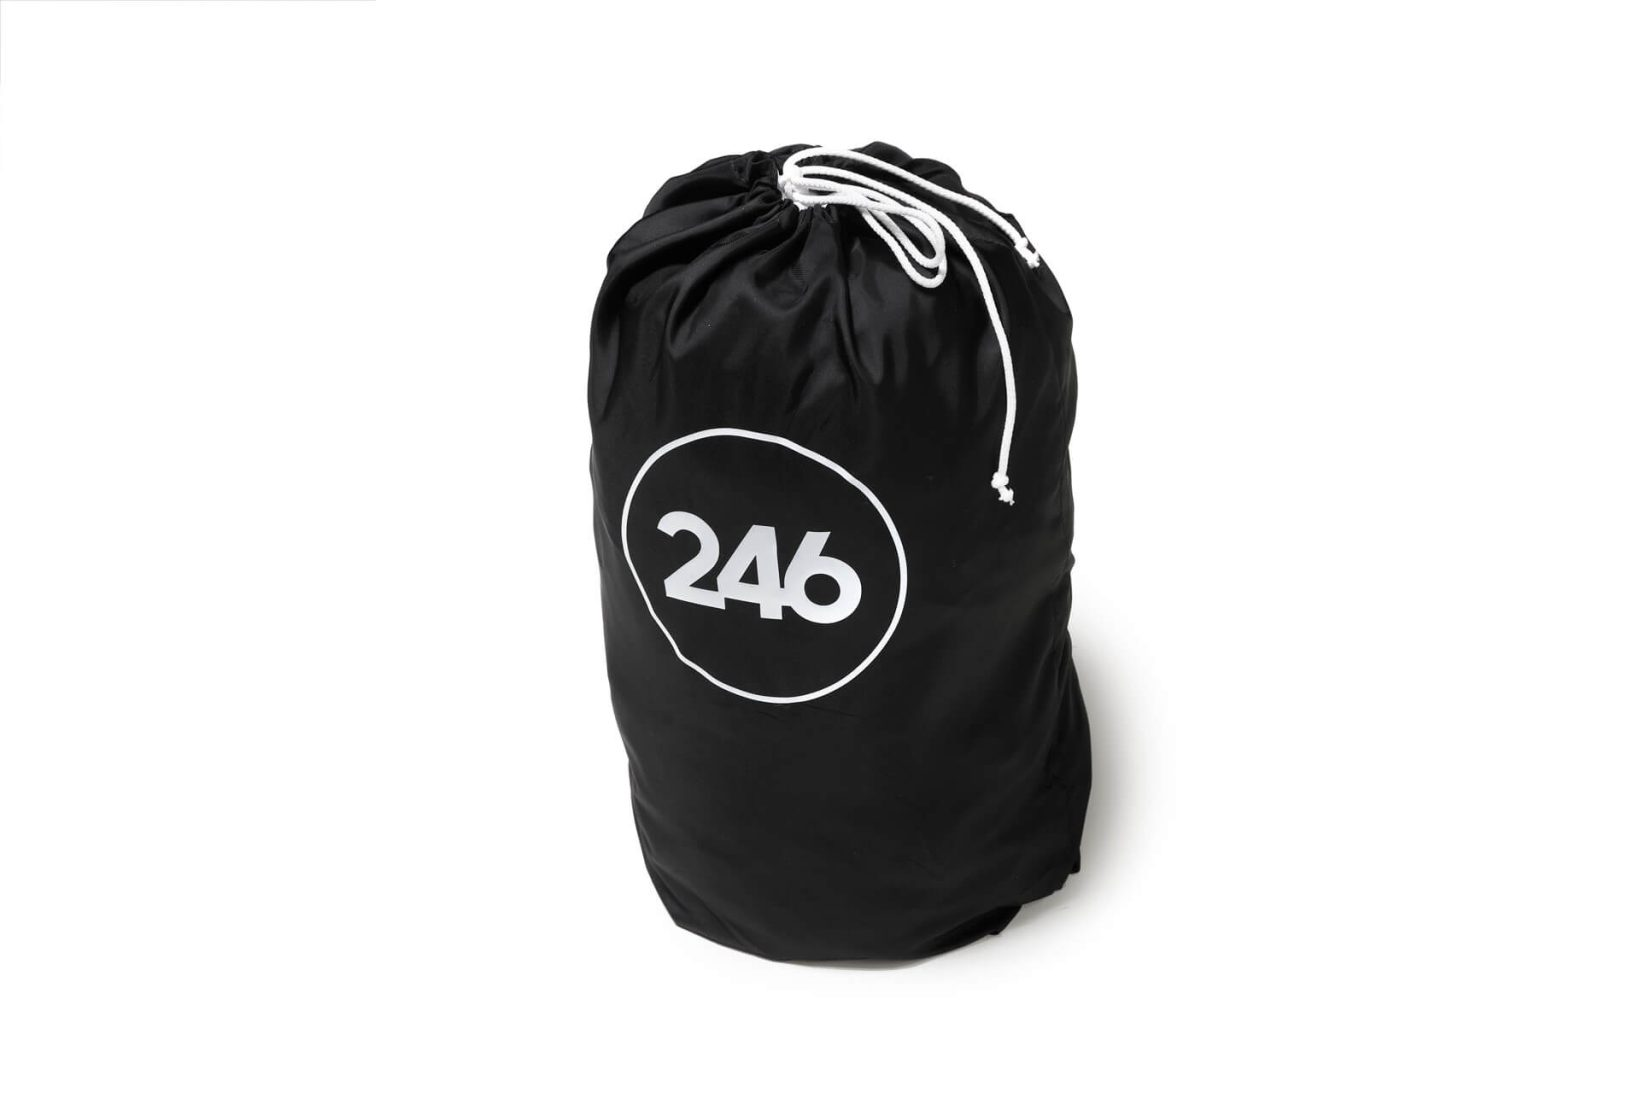 Sacco per coperta nera in pile tecnico per cavalli | 246 Reiner Professional